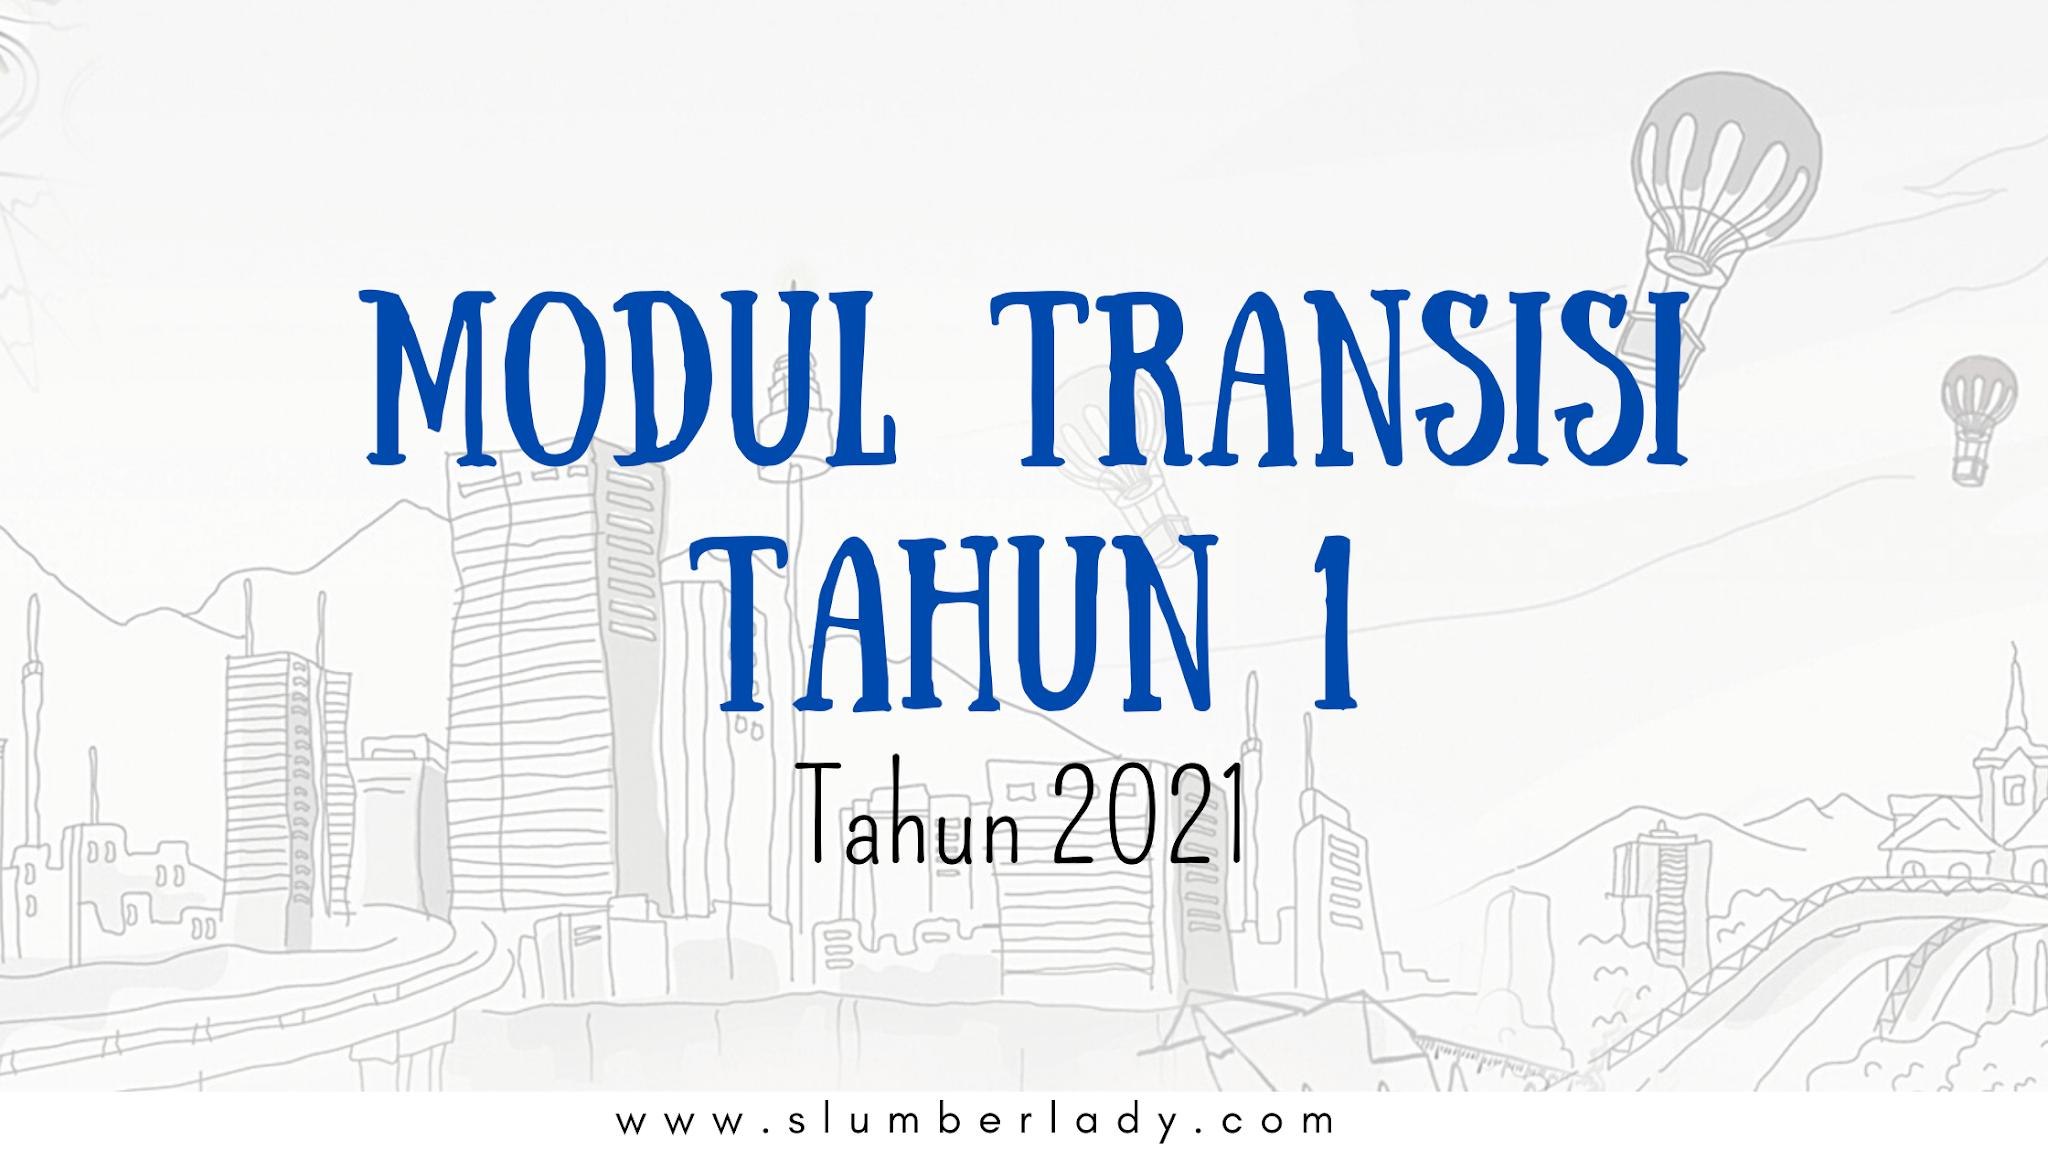 modul transisi tahun 1 2021